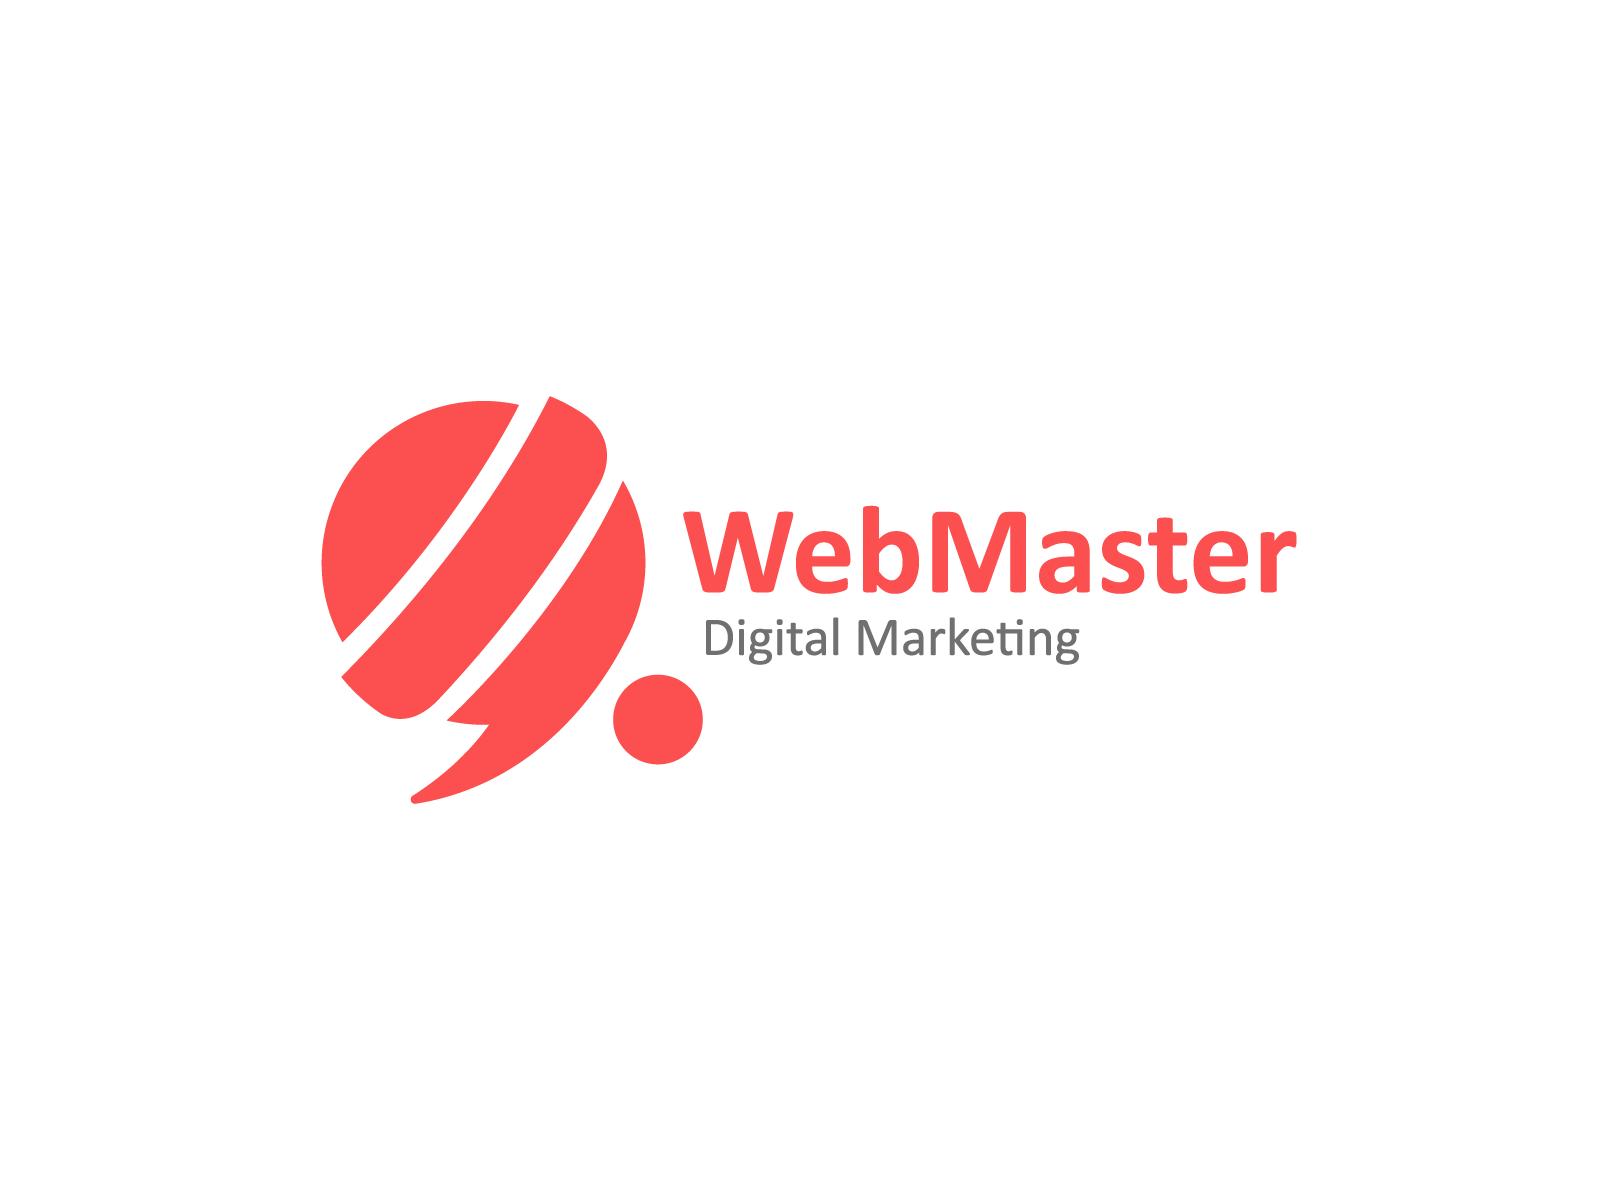 Digital Marketing Logo Design by Cappu - Shahab Ebadi on ...